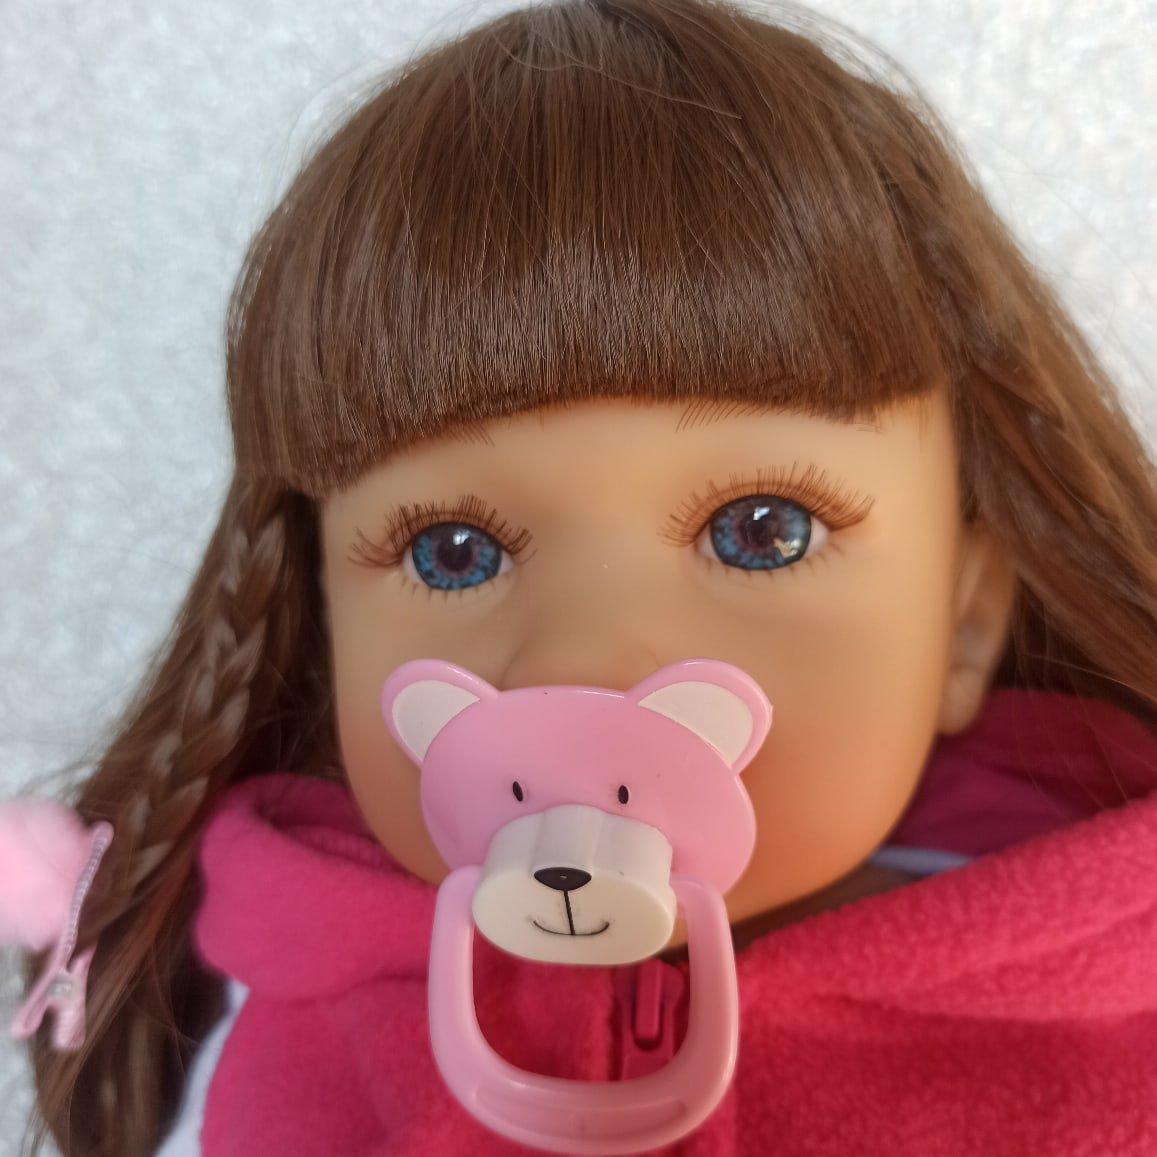 Красивая реалистичная кукла бренда NPK - Алиэкспресс